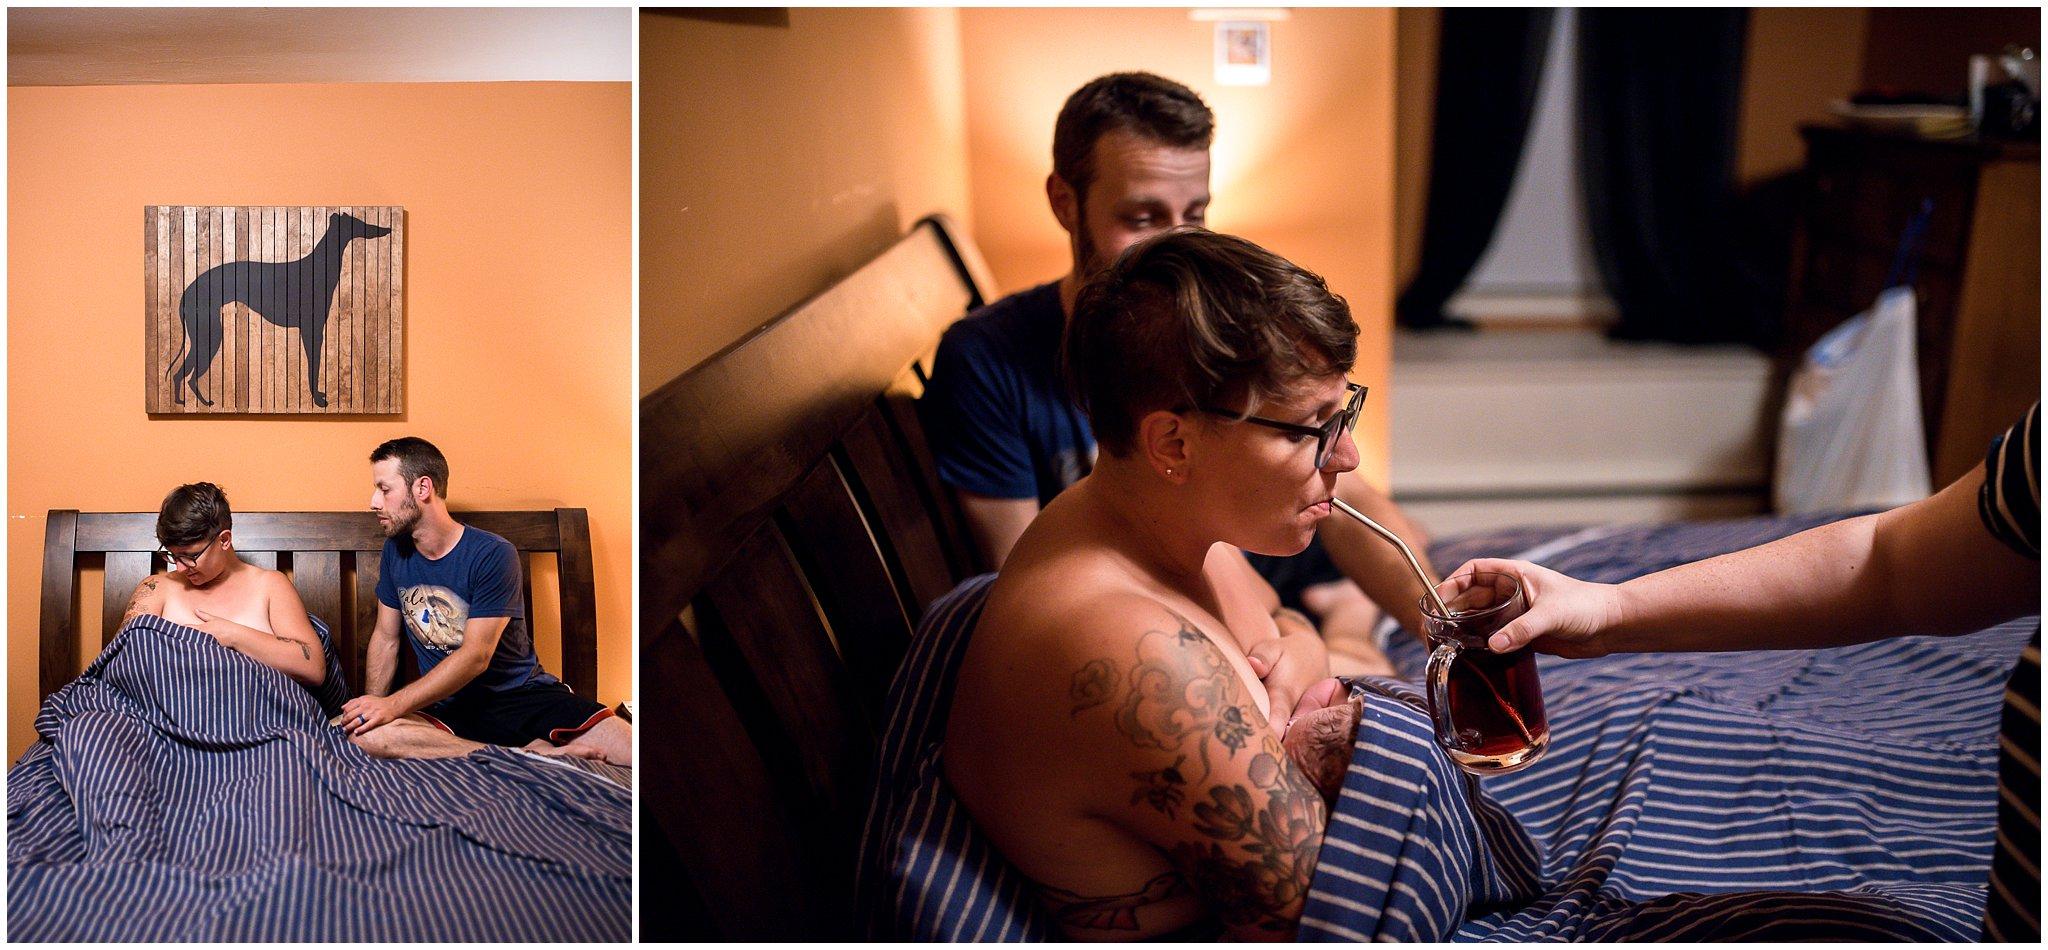 Grand Rapids home birth photographer - Annica Quakenbush - drinking juice nursing